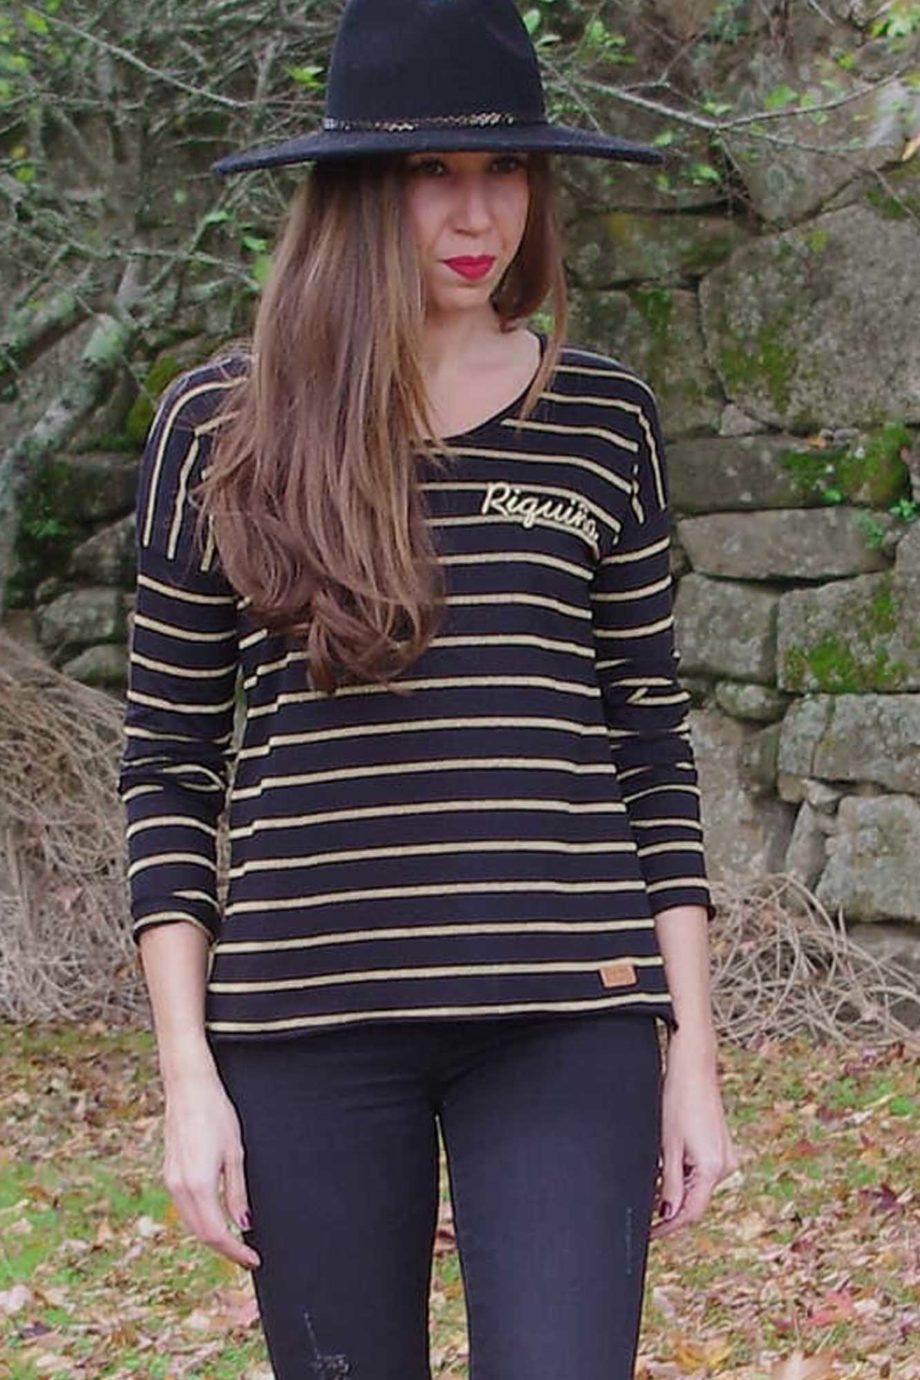 SOMOSOCEANO-camiseta-RIQUIÑA-ORO